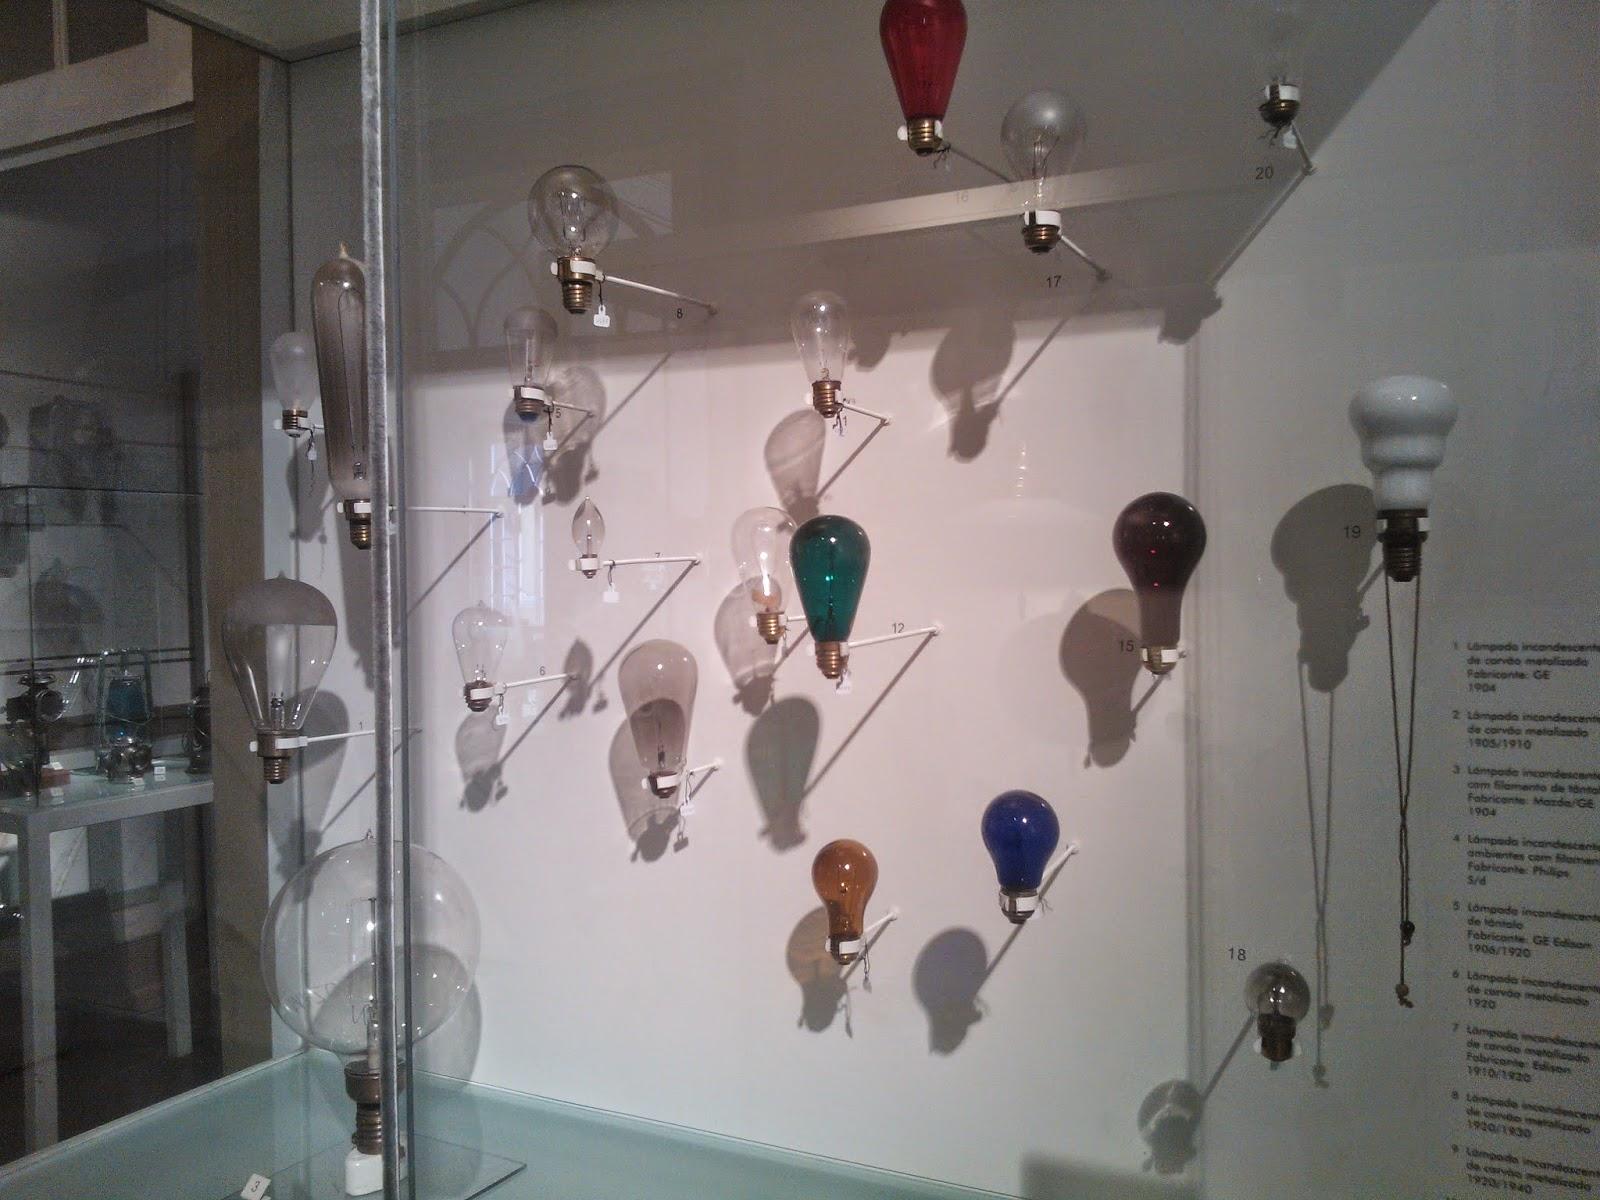 lâmpadas incandescentes - Museu da Energia, Itu-SP